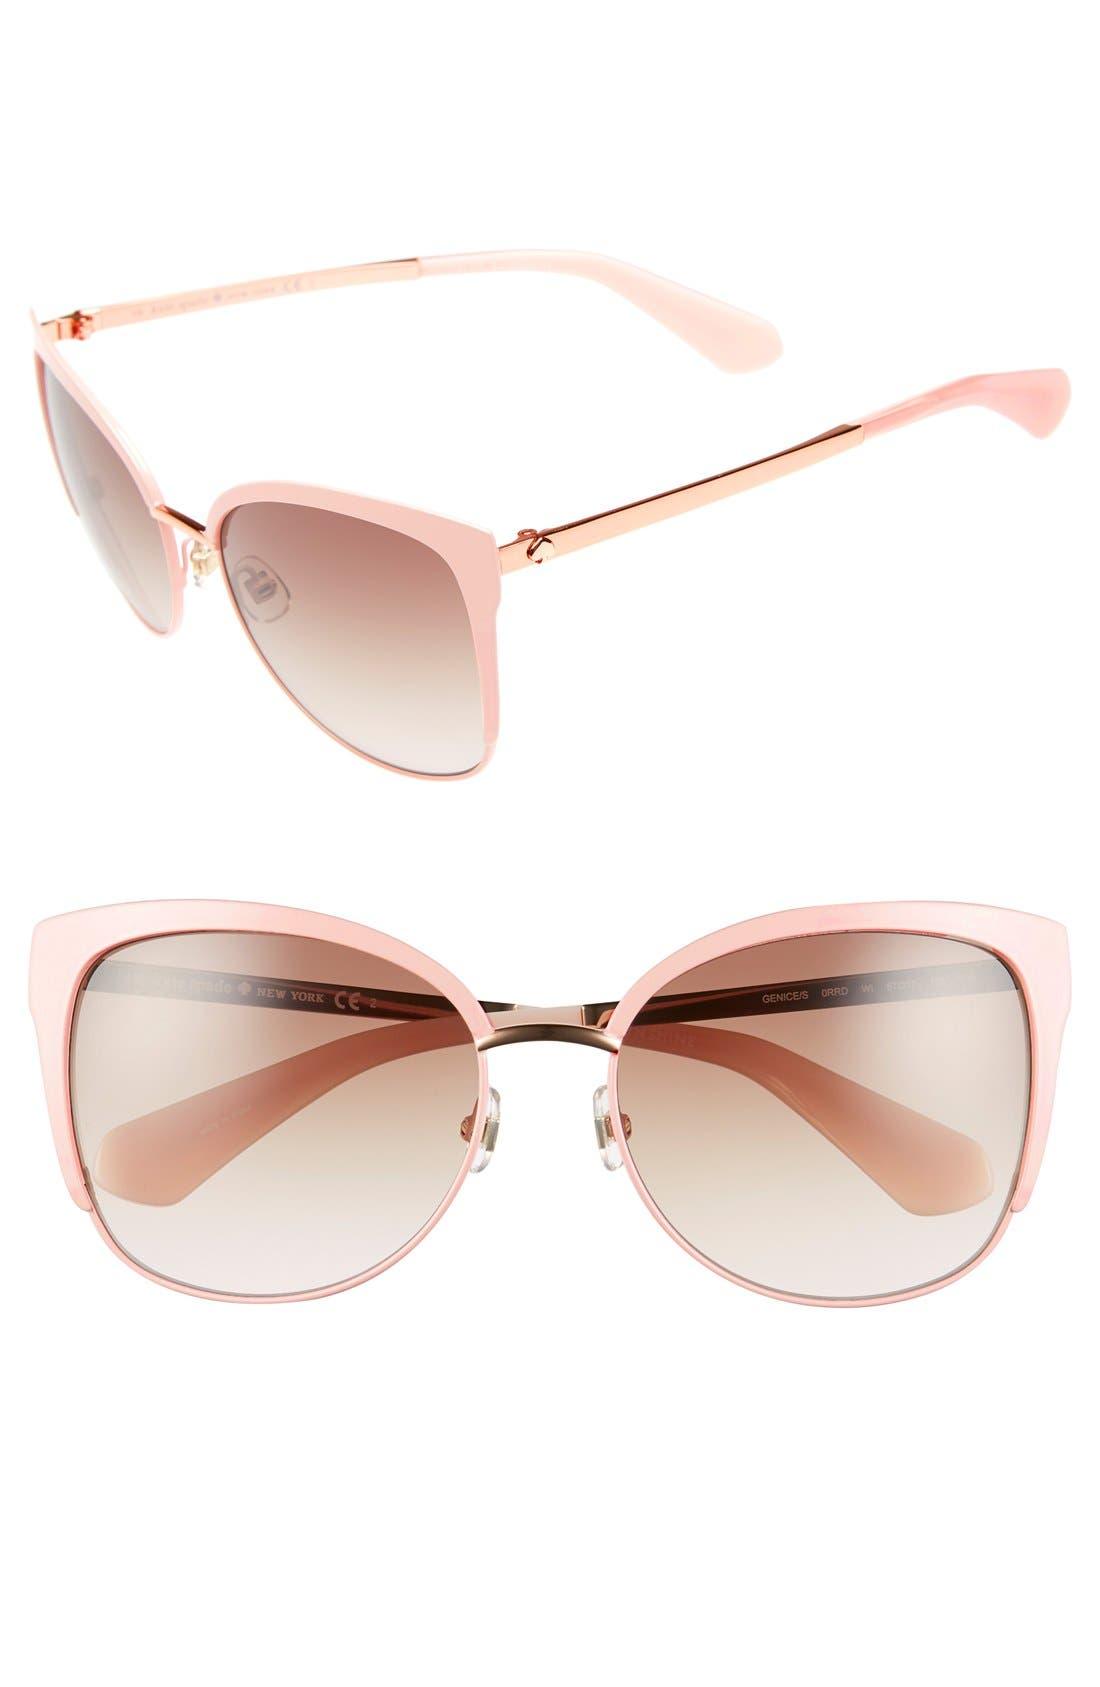 KATE SPADE NEW YORK genice 57mm cat-eye sunglasses